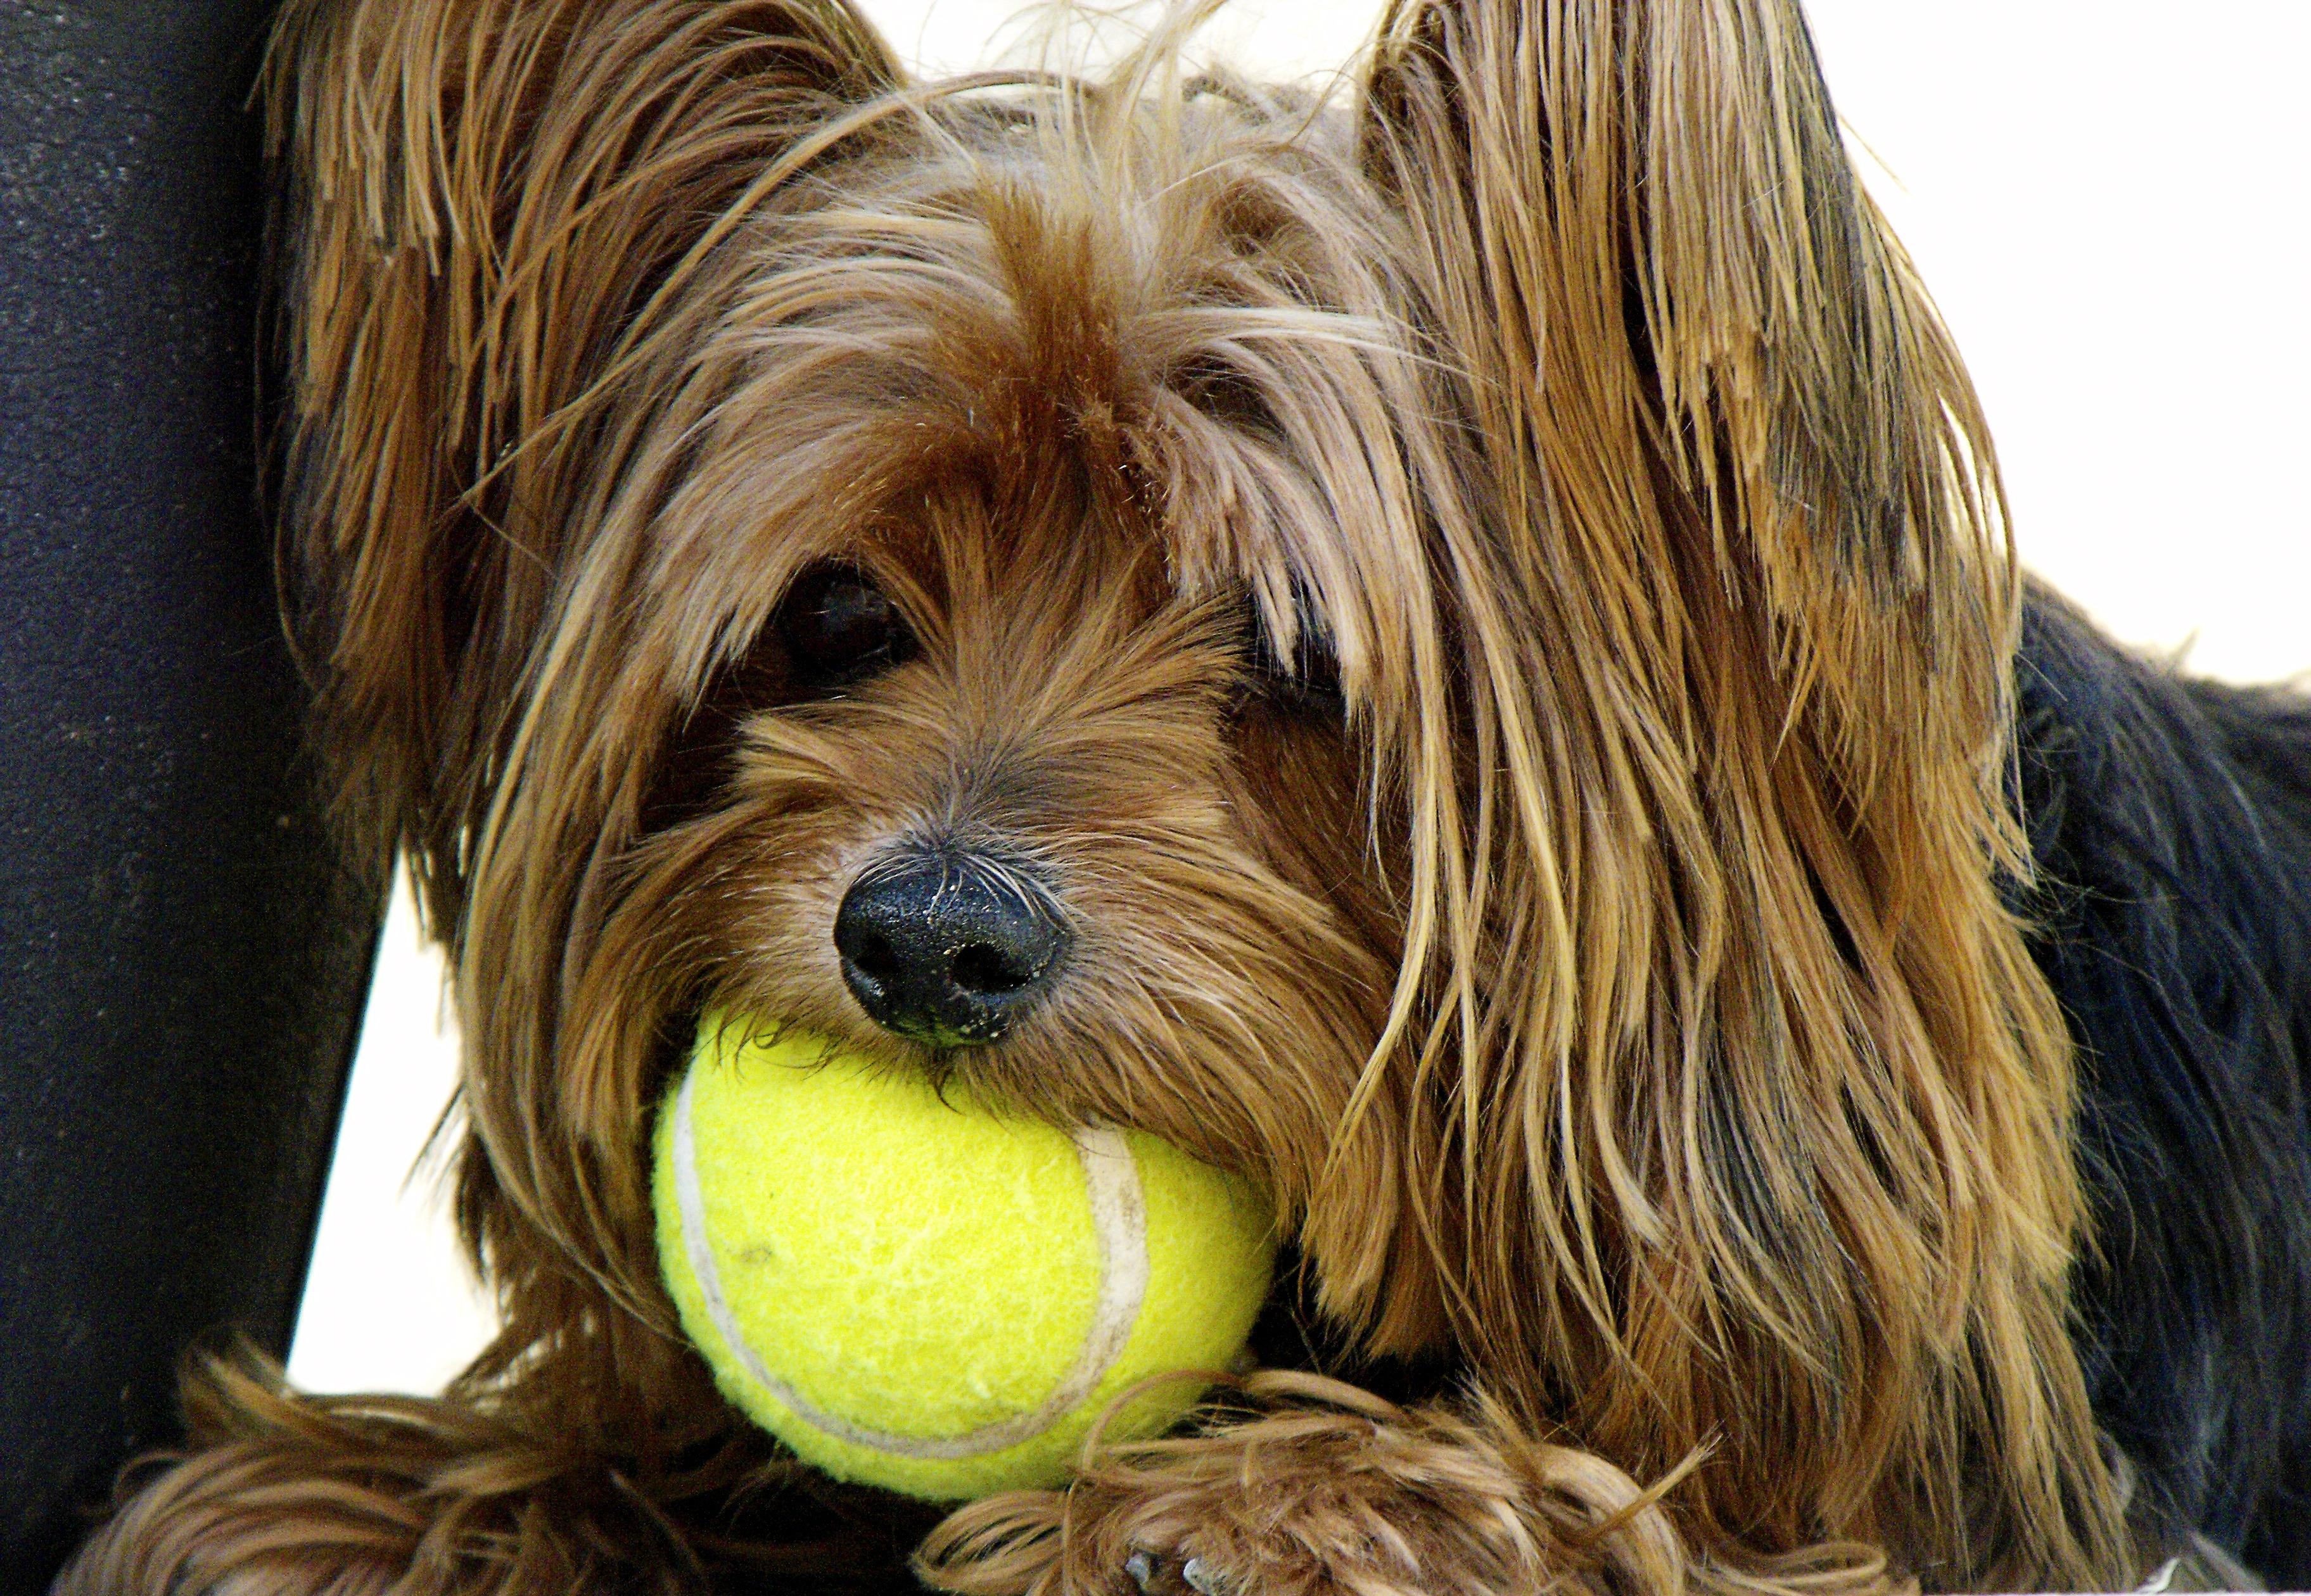 Amazing Cairn Terrier Ball Adorable Dog - dog-mammal-vertebrate-dog-breed-terrier-yorkshire-terrier-tennis-ball-cairn-terrier-tibetan-terrier-australian-silky-terrier-dog-like-mammal-australian-terrier-schnoodle-dandie-dinmont-terrier-glen-of-imaal-terrier-dog-crossbreeds-morkie-norwich-terrier-norfolk-terrier-lowchen-1120099  Photograph_389057  .jpg